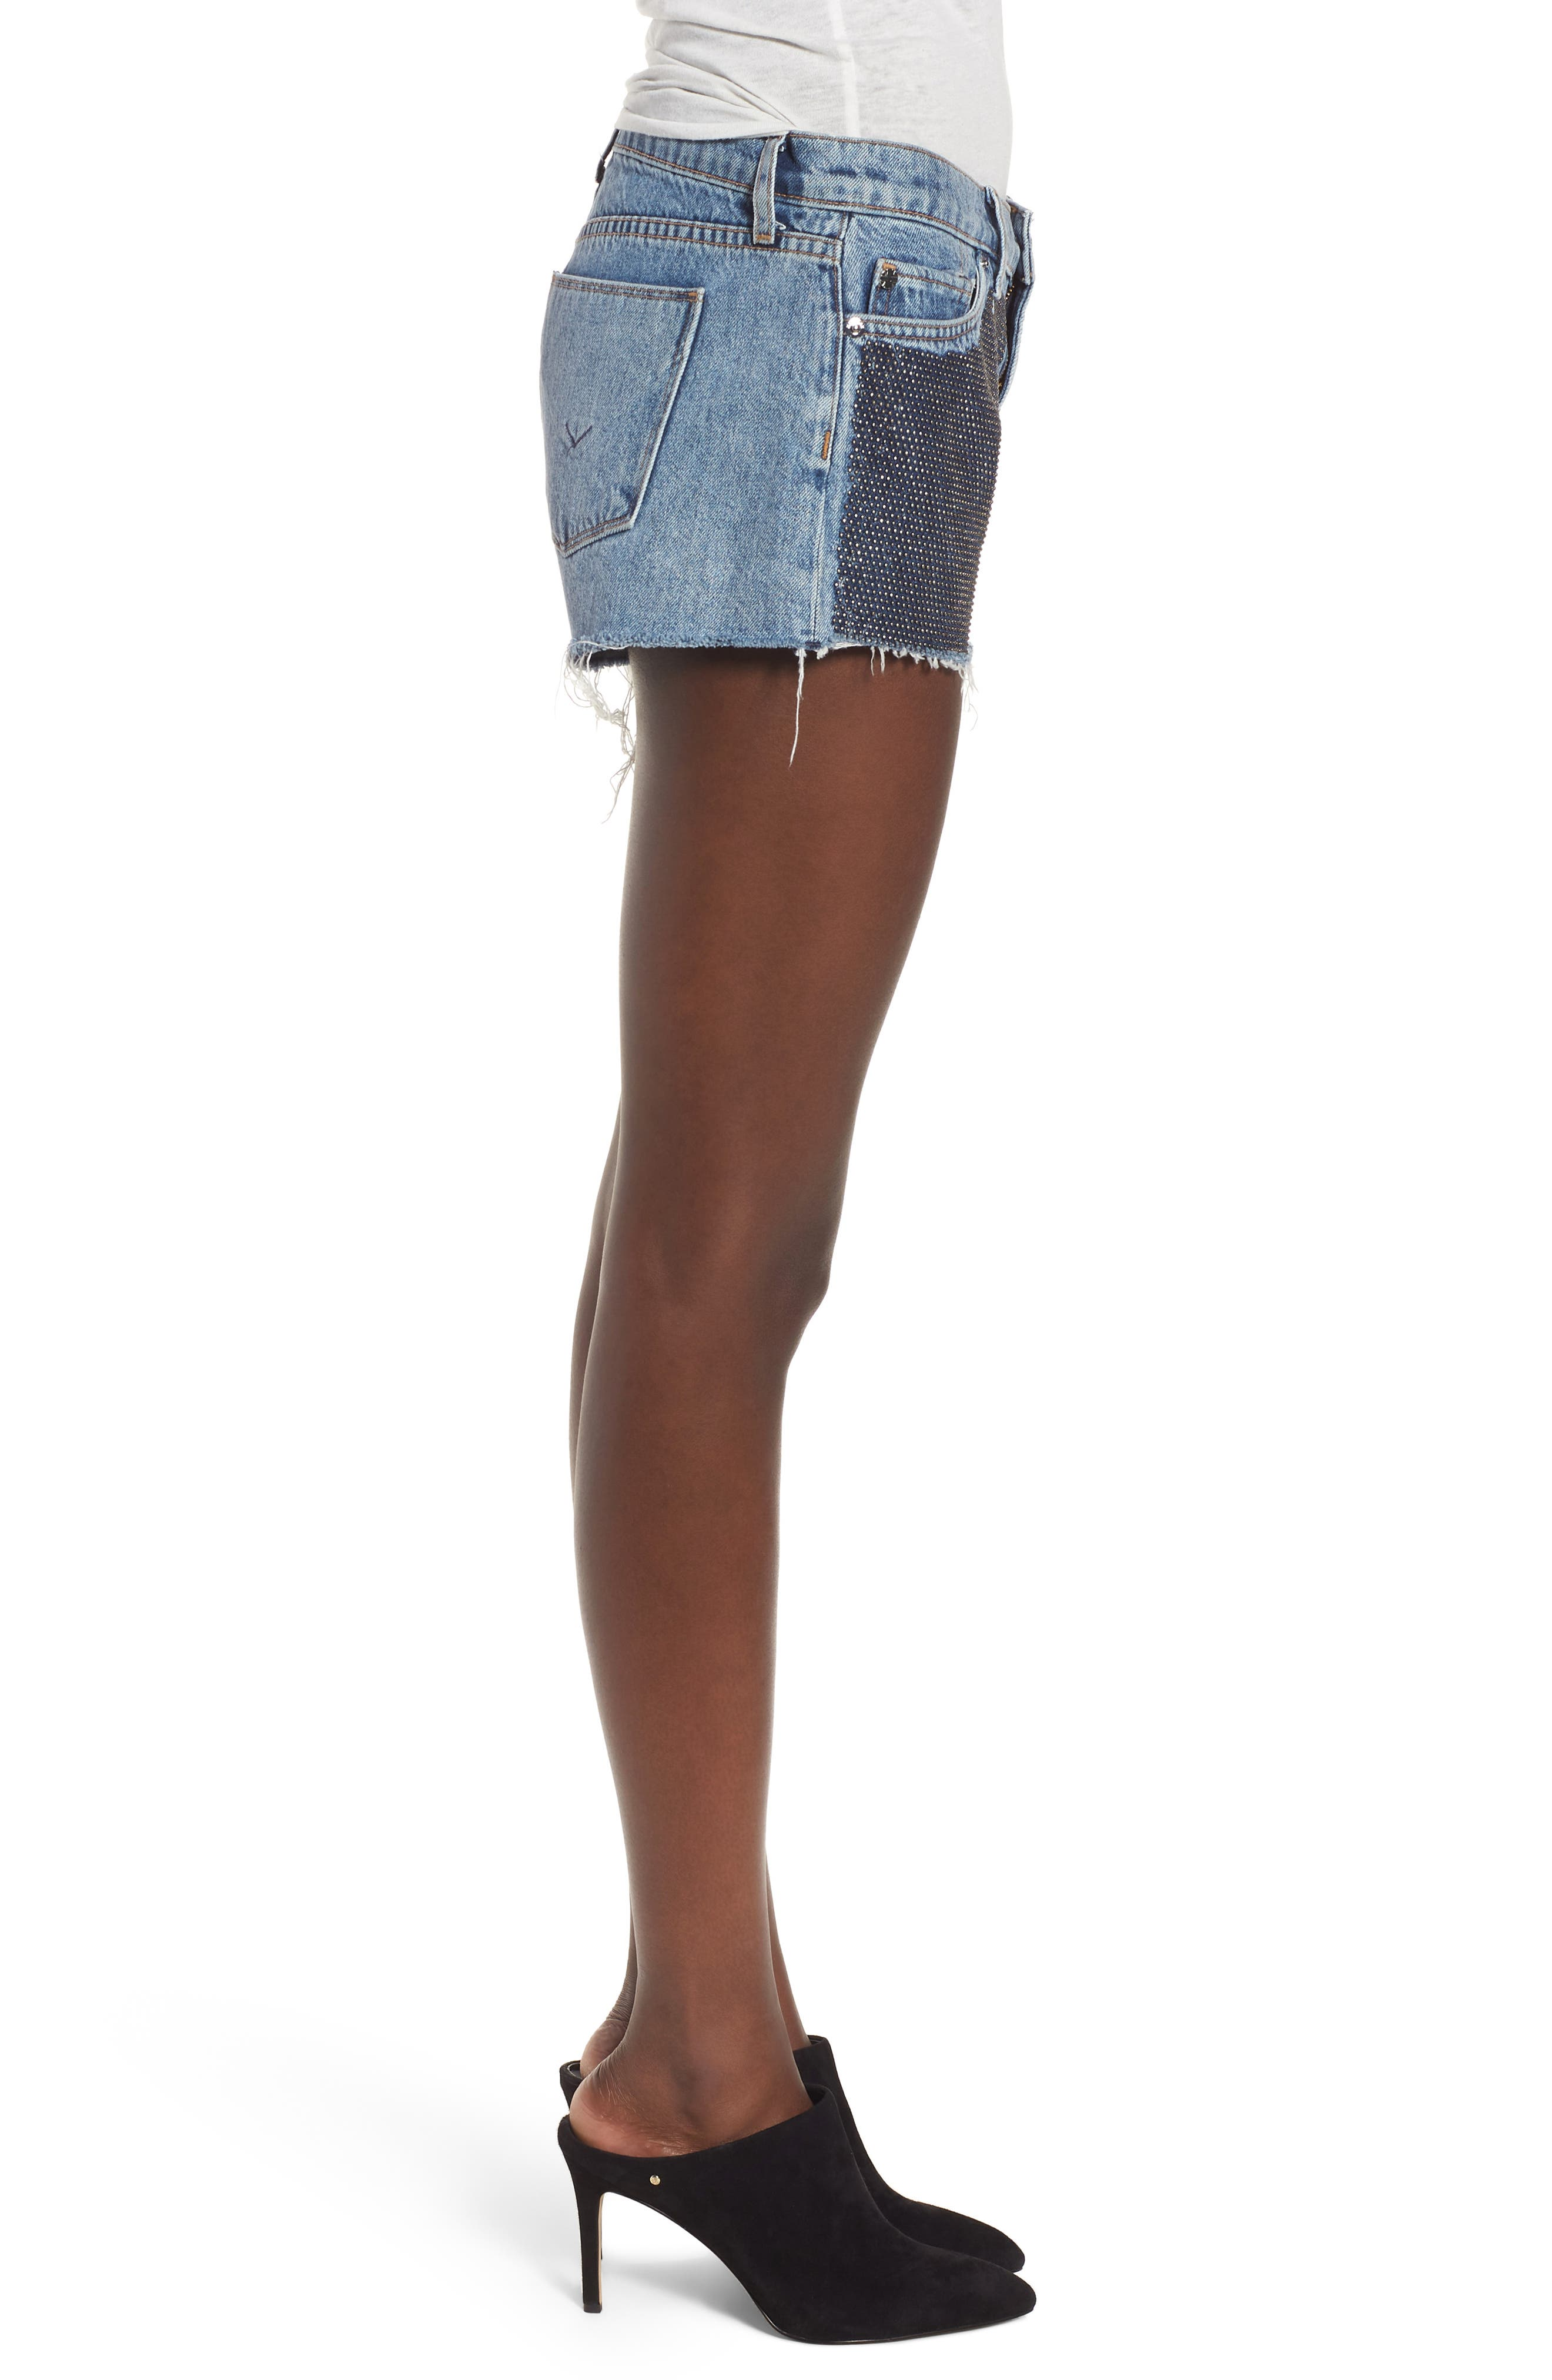 Kenzie Studded Cutoff Denim Shorts,                             Alternate thumbnail 3, color,                             Metal Mark